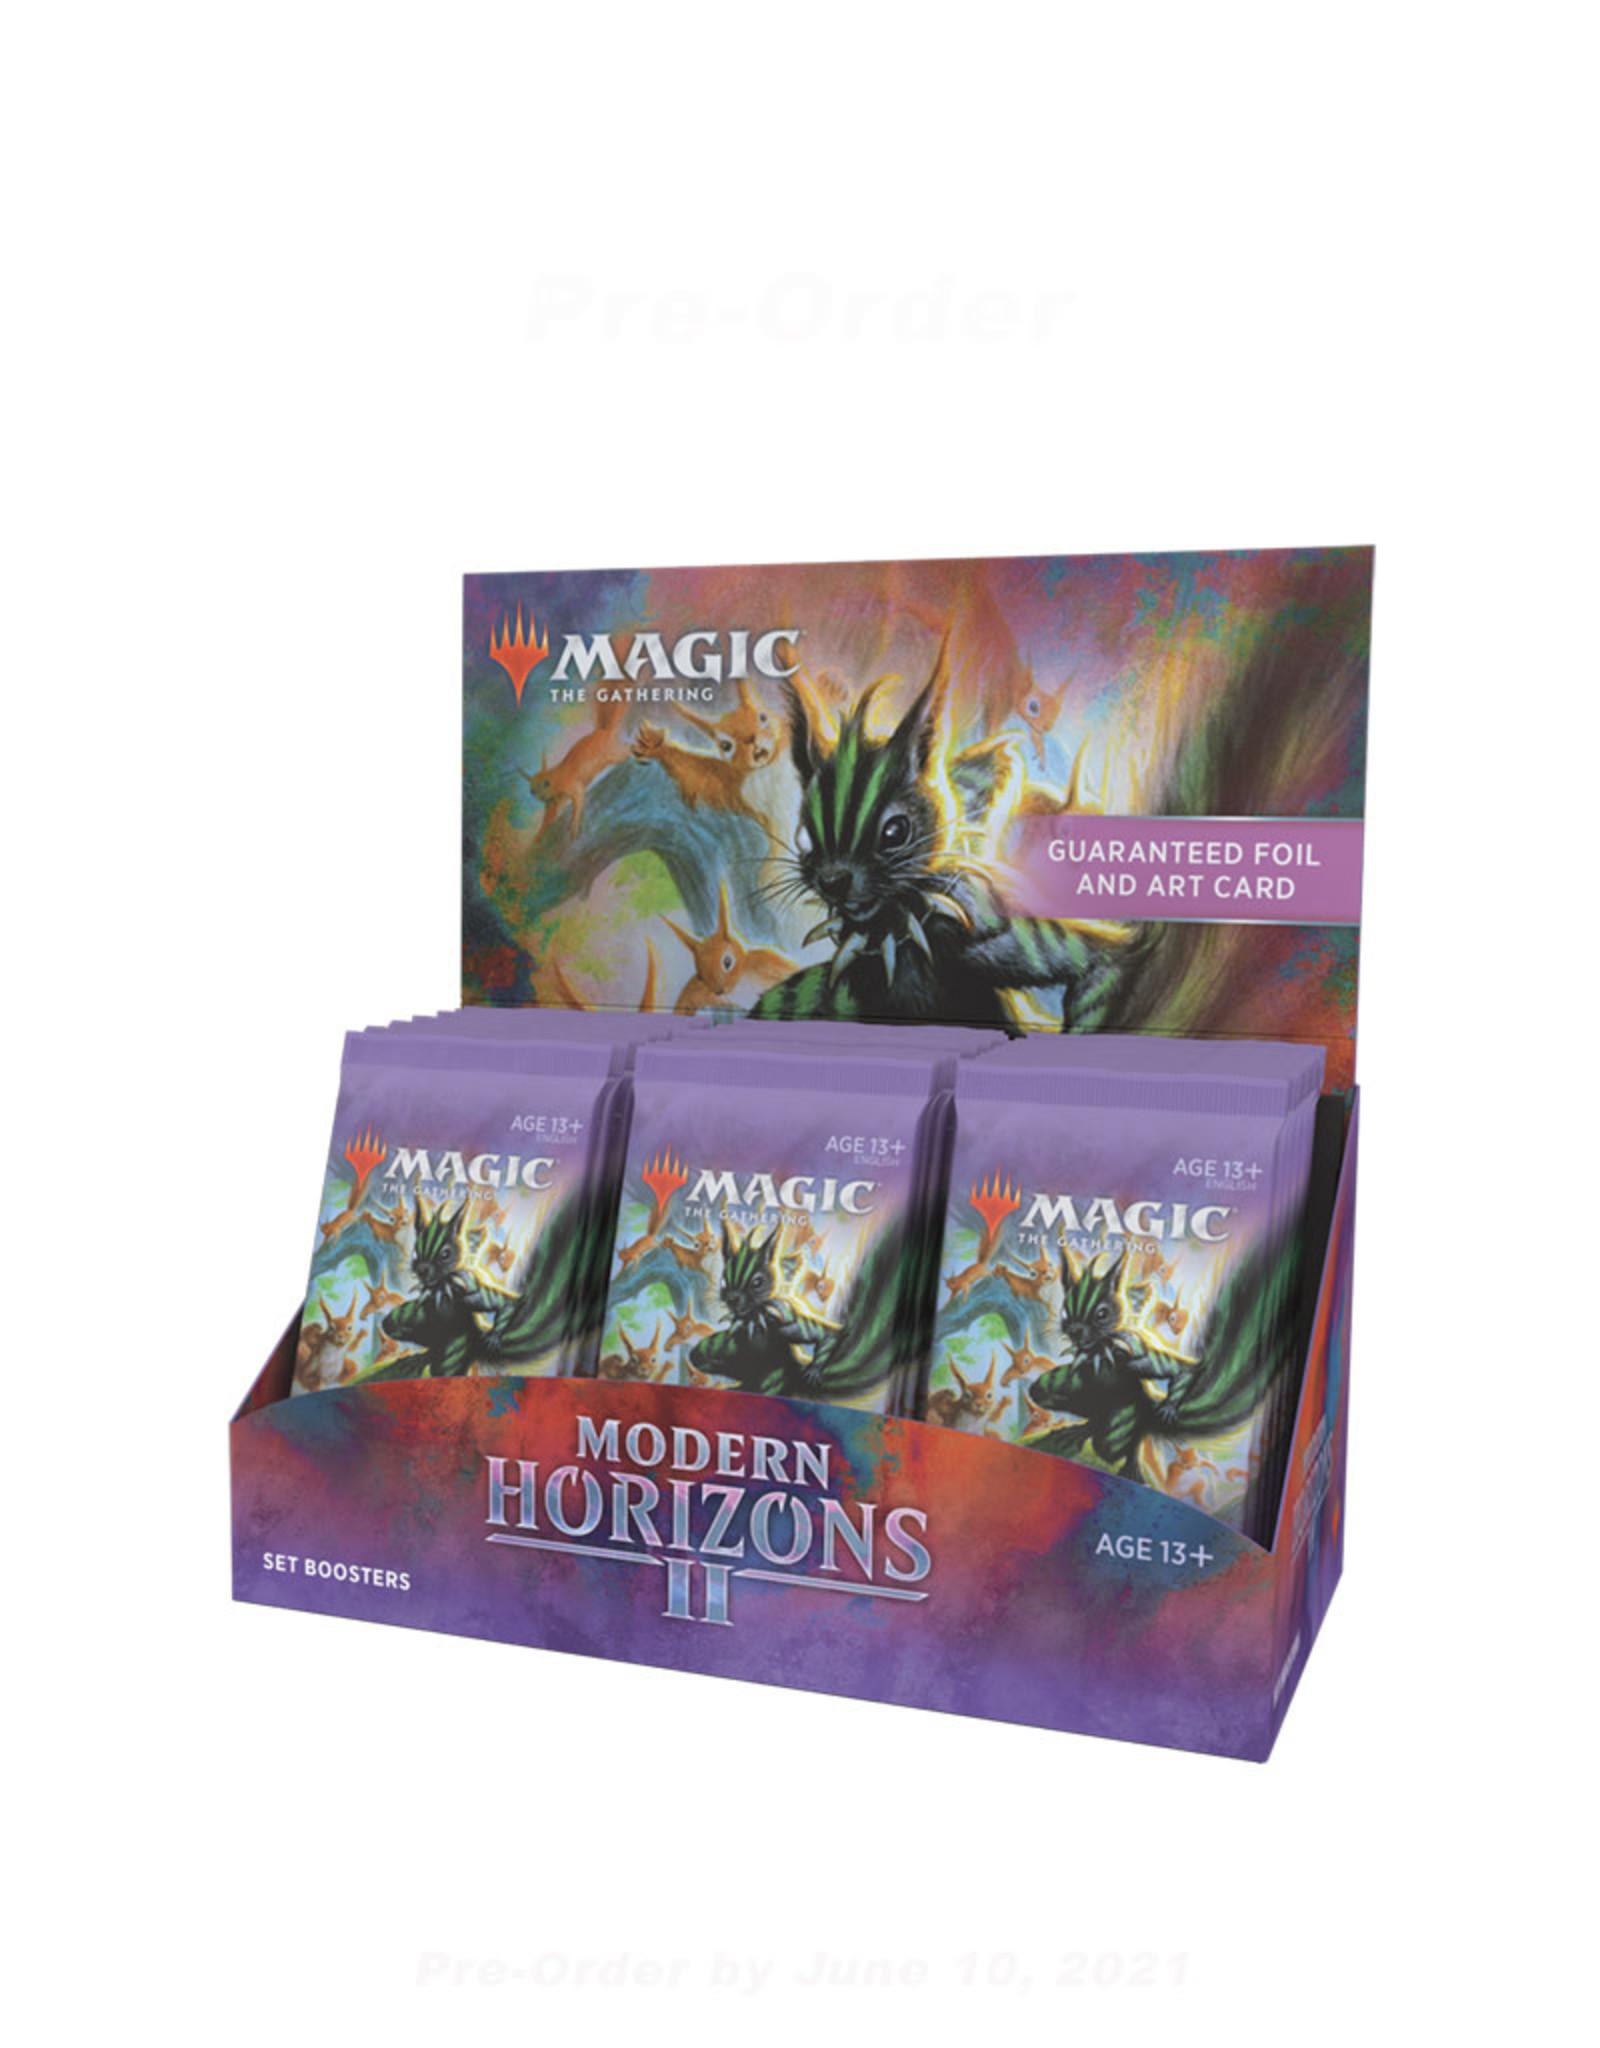 Wizards of the Coast MTG Modern Horizons 2 Set Booster (30) Box Display